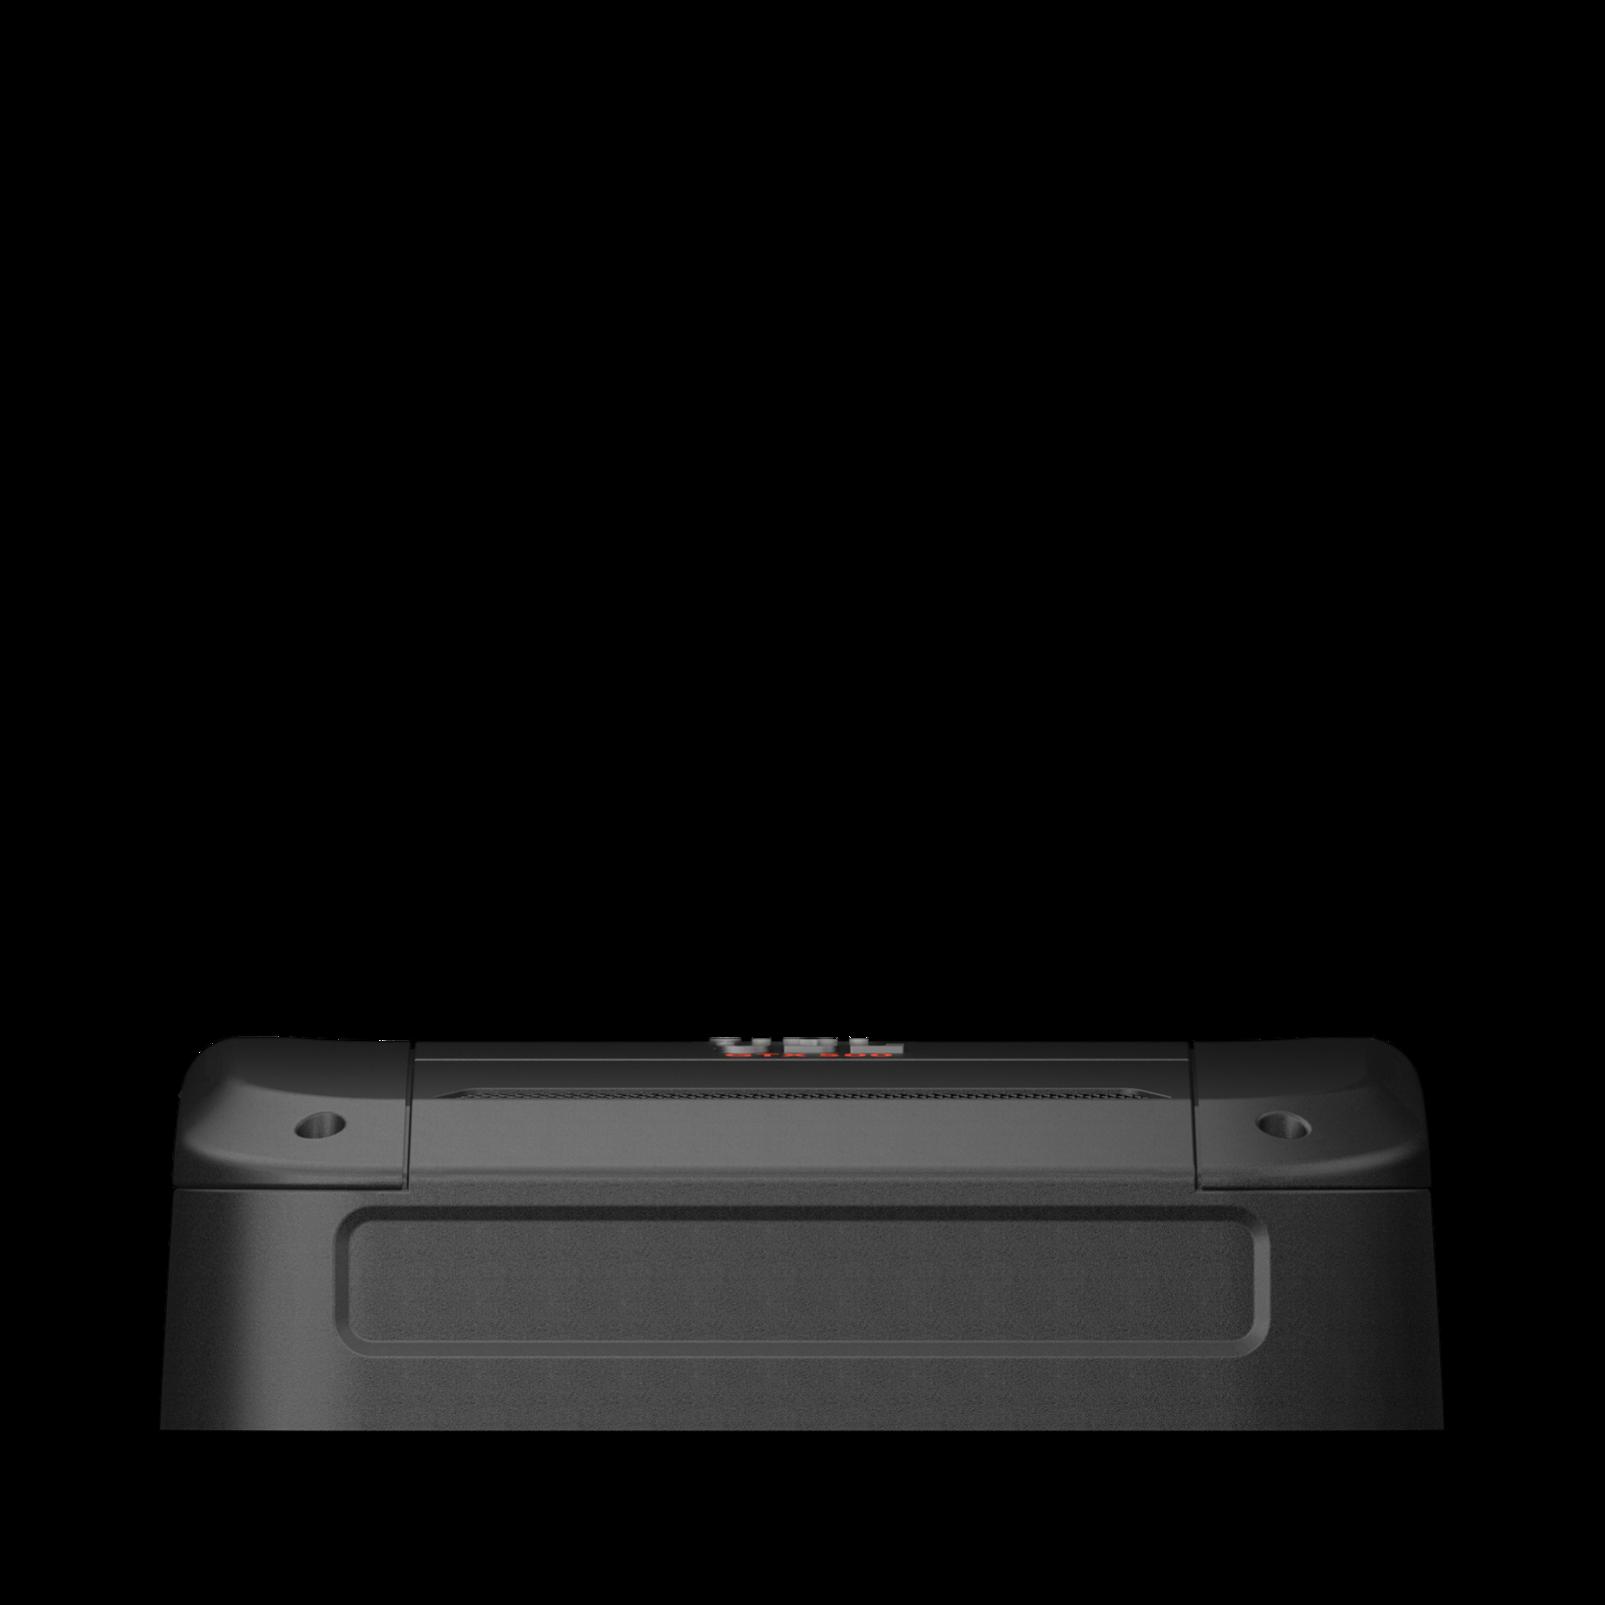 Gtx 500 750 Watt Mono Subwoofer Amplifier 1channel Dvc Wiring Diagram